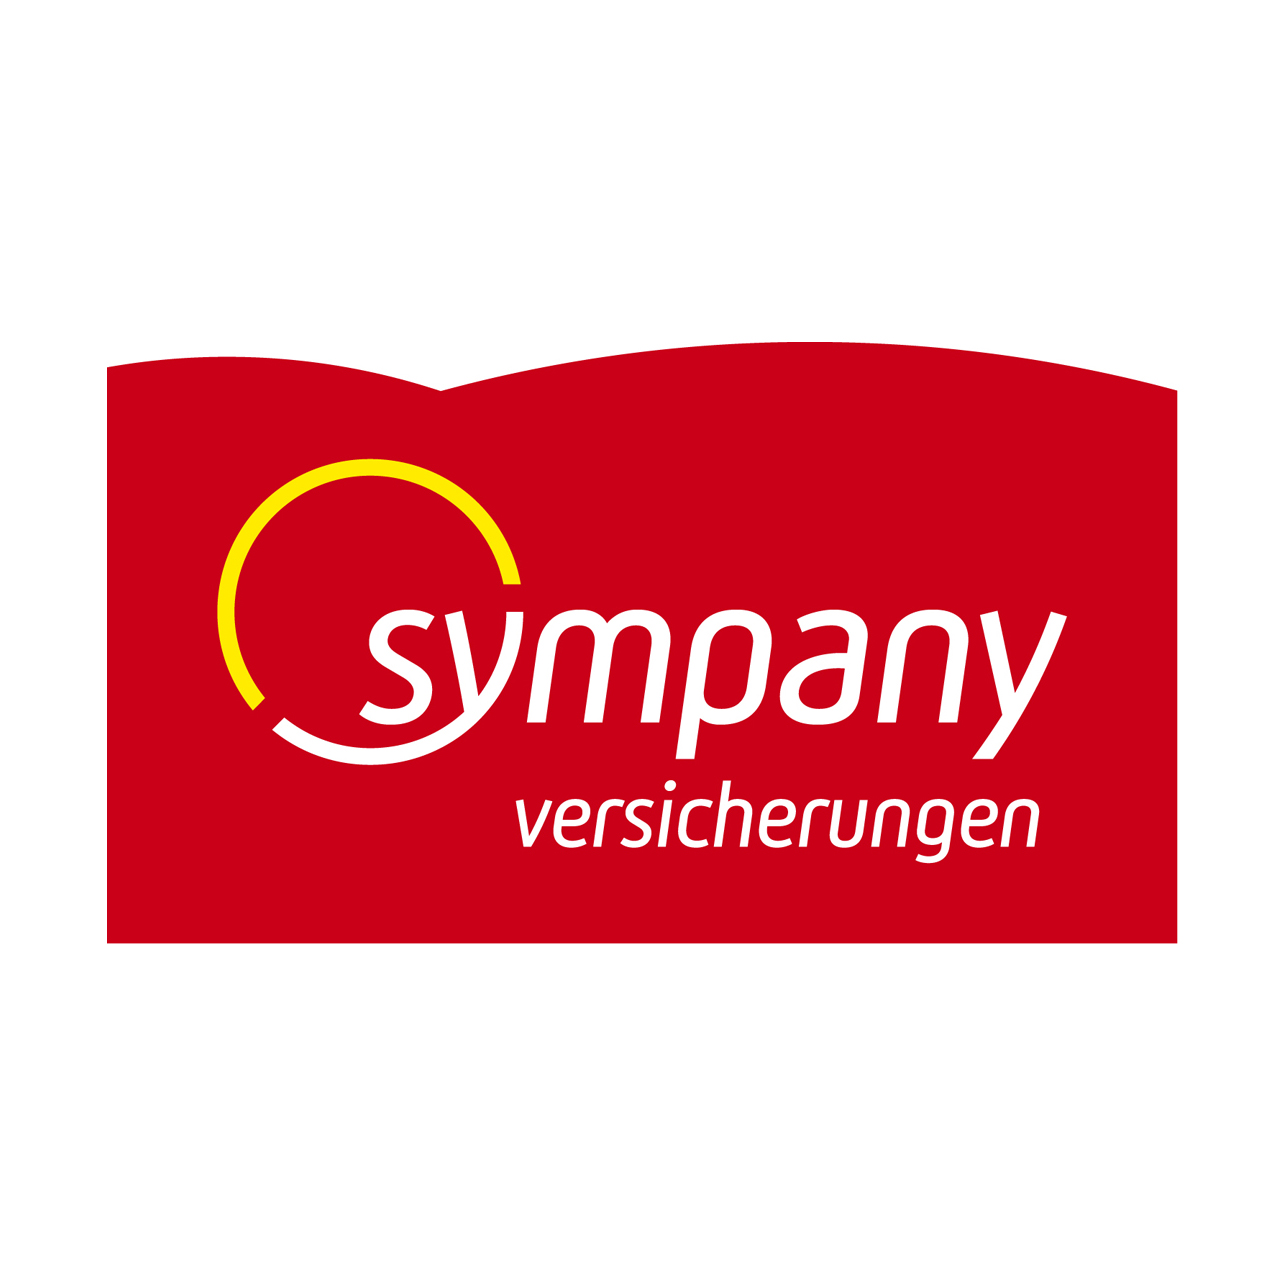 Sympany_20181101.jpg